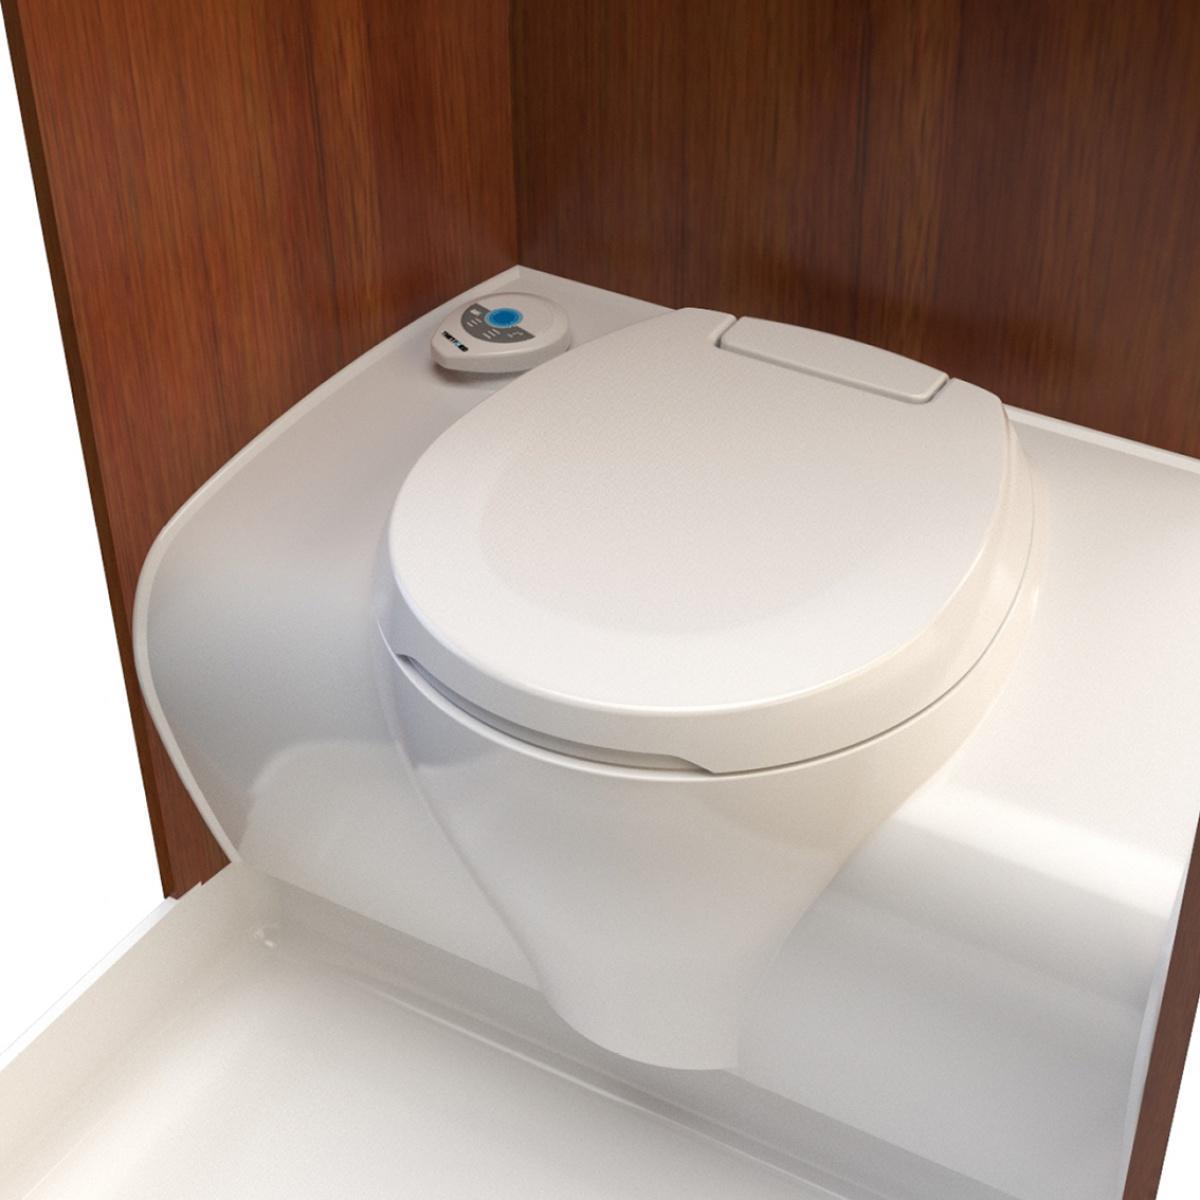 Pleasing Hegge Id Product Design Rv Toilet Multifunctional Control Uwap Interior Chair Design Uwaporg